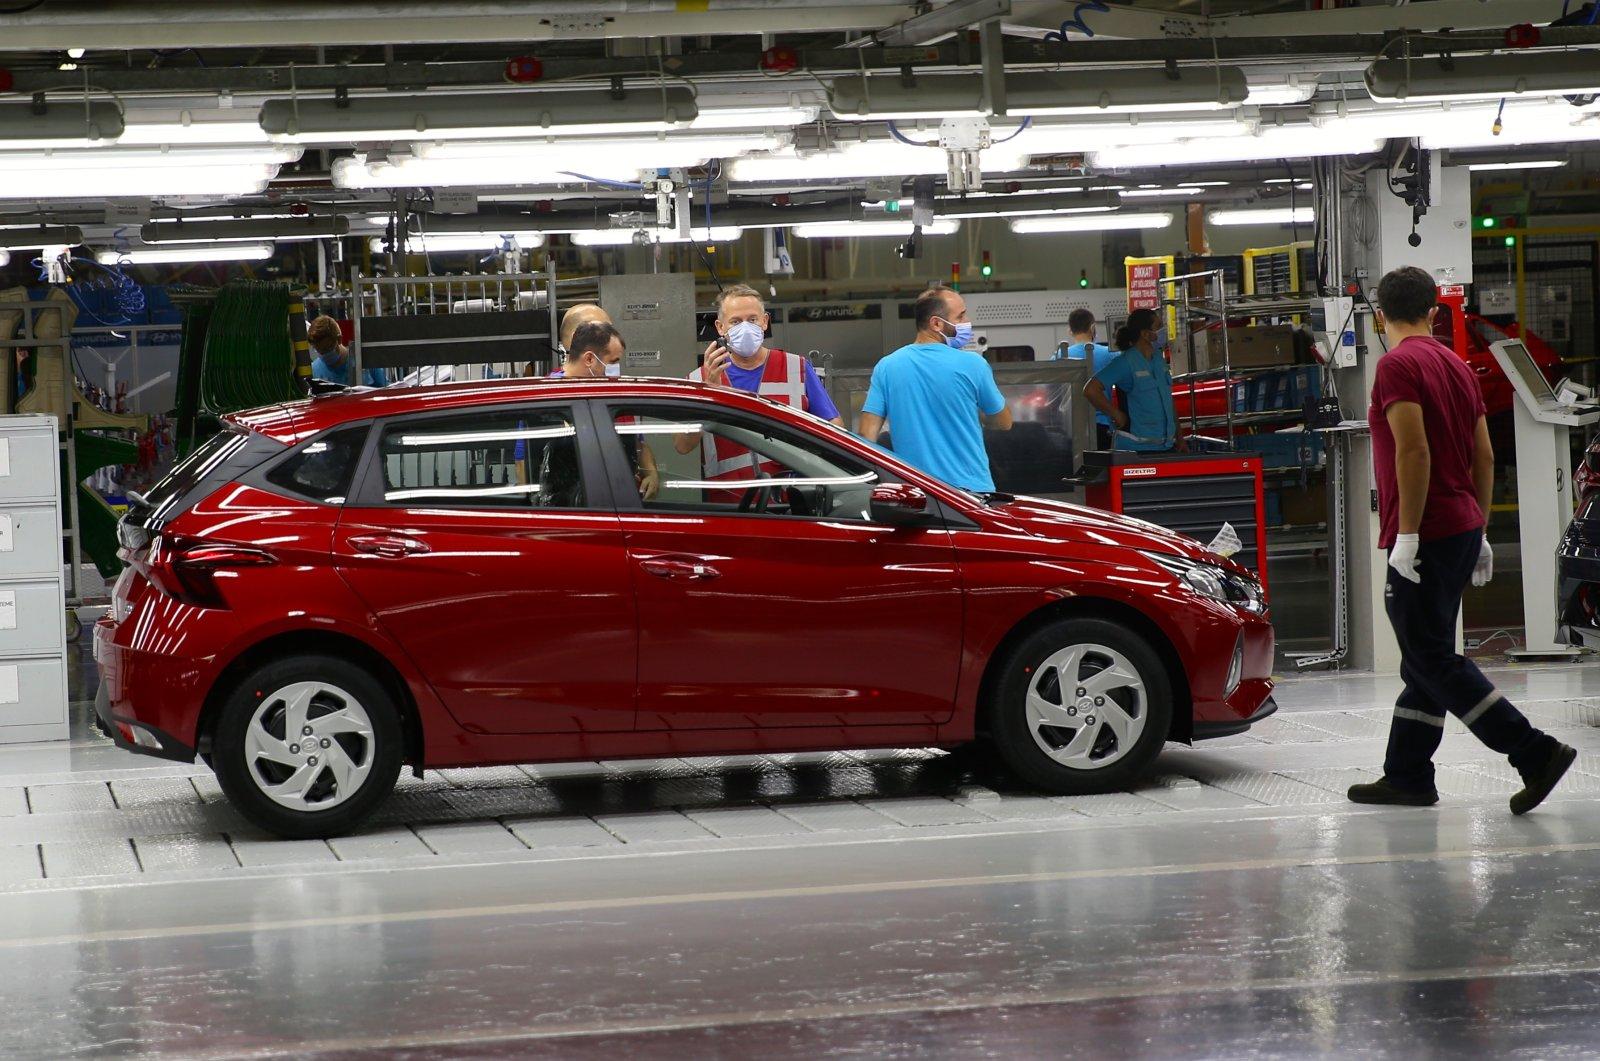 Workers are seen beside a car at Hyundai Assan's Izmit factory in northwestern Kocaeli, Turkey, Aug. 28, 2020. (AA Photo)